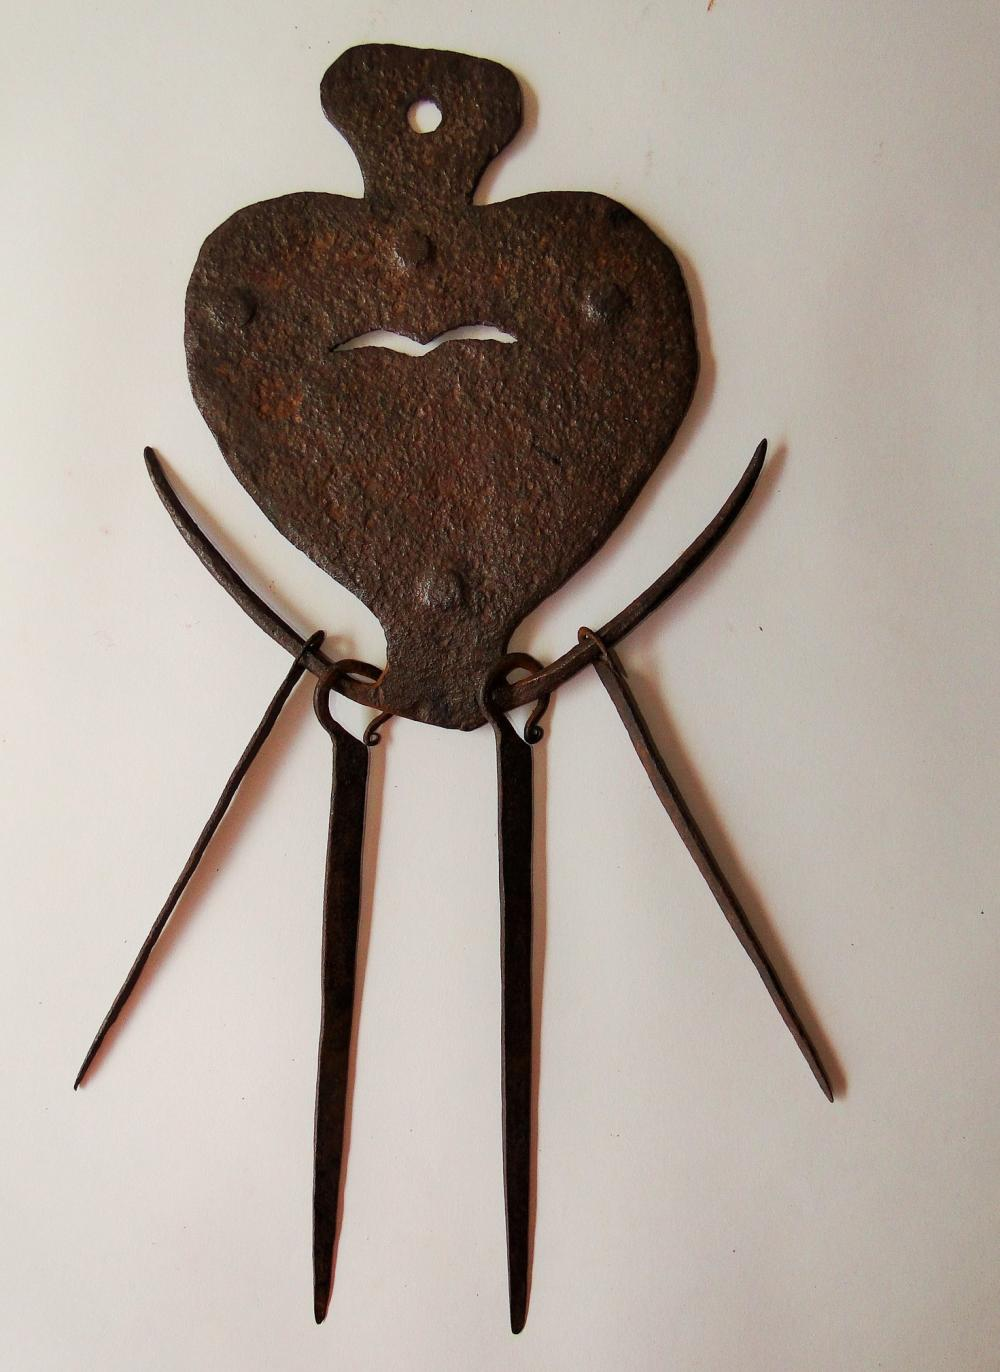 18TH C IRON HEART SKEWER SET